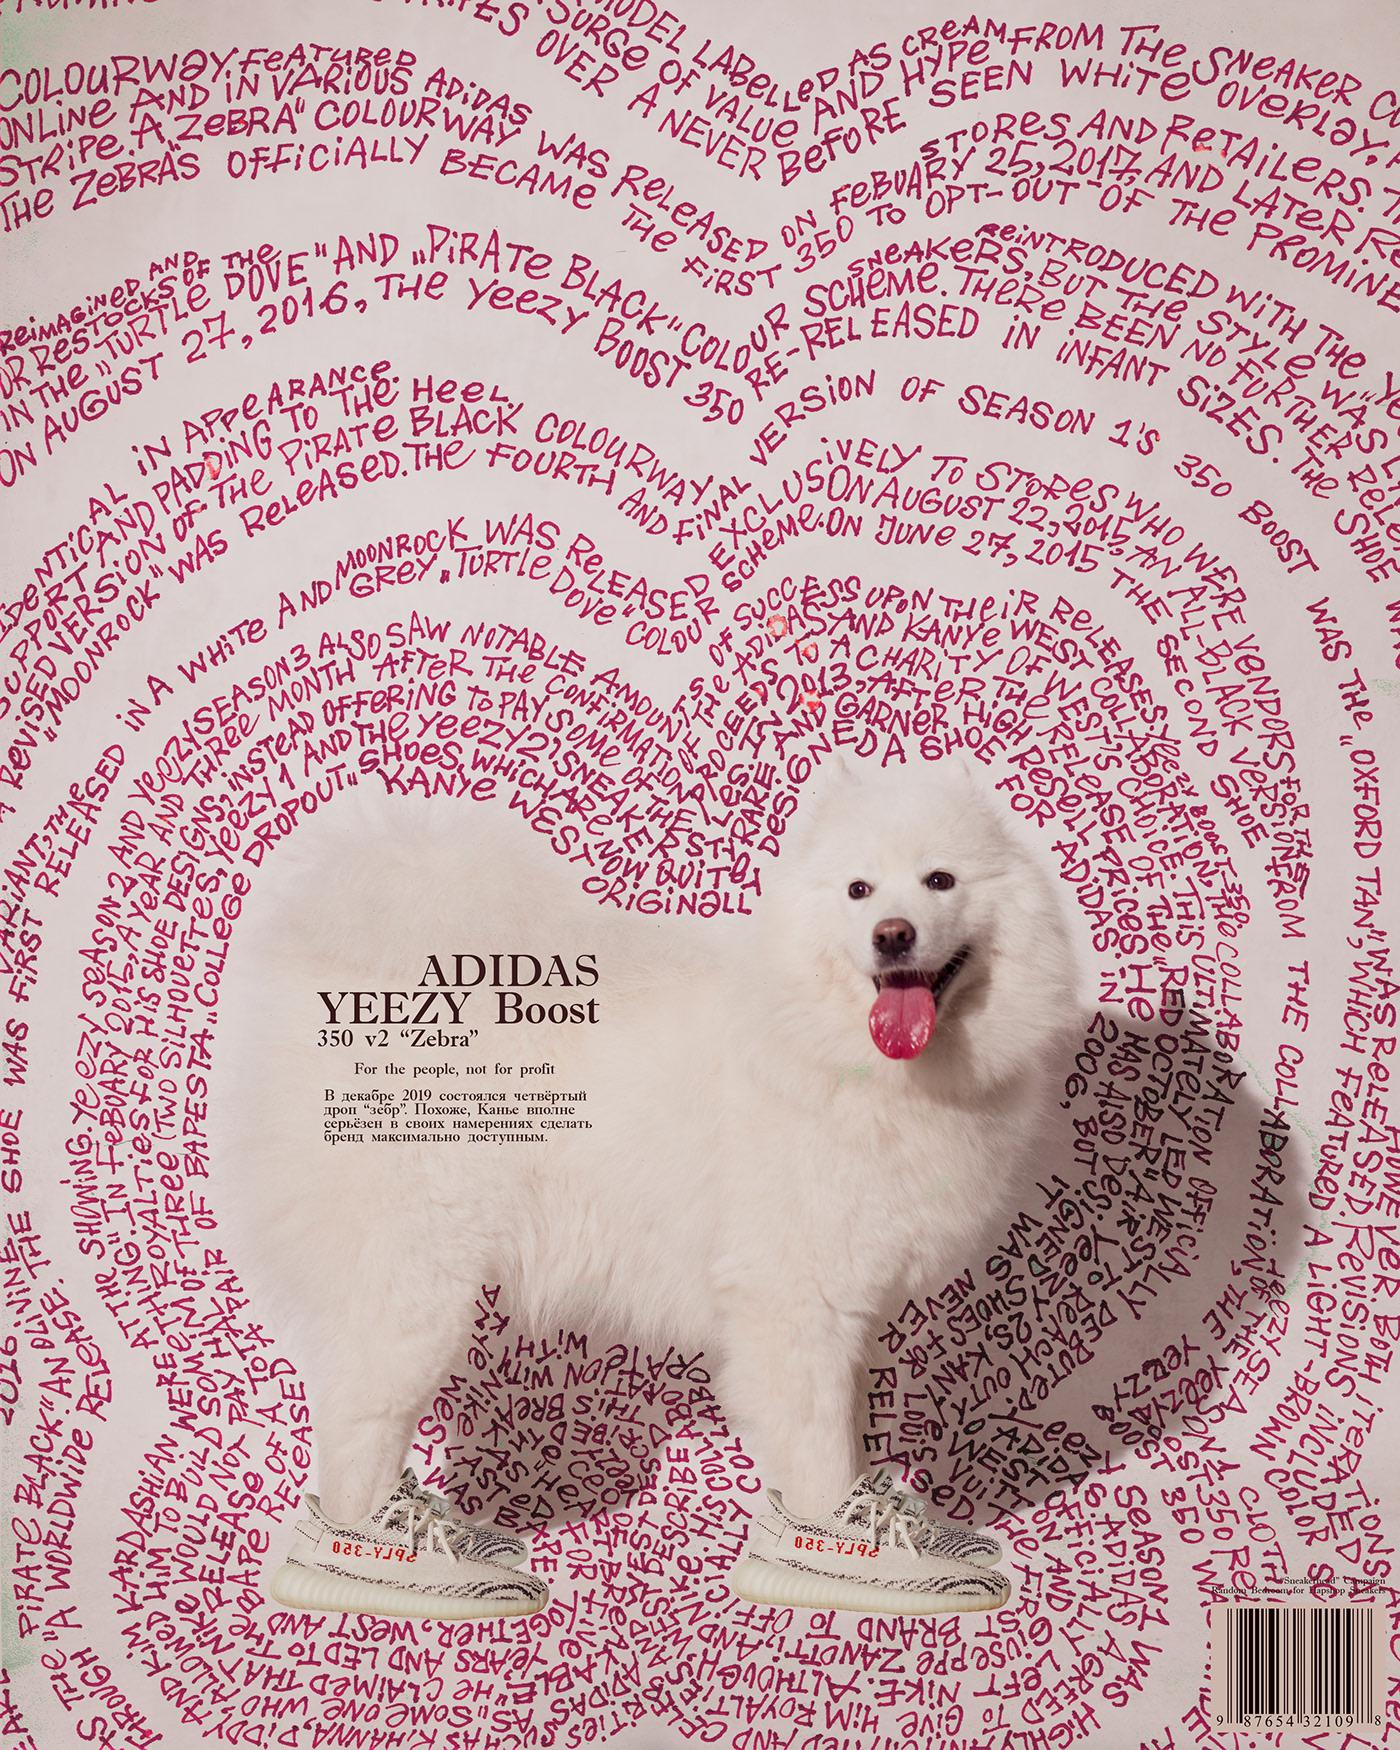 Image may contain: carnivore, animal and dog